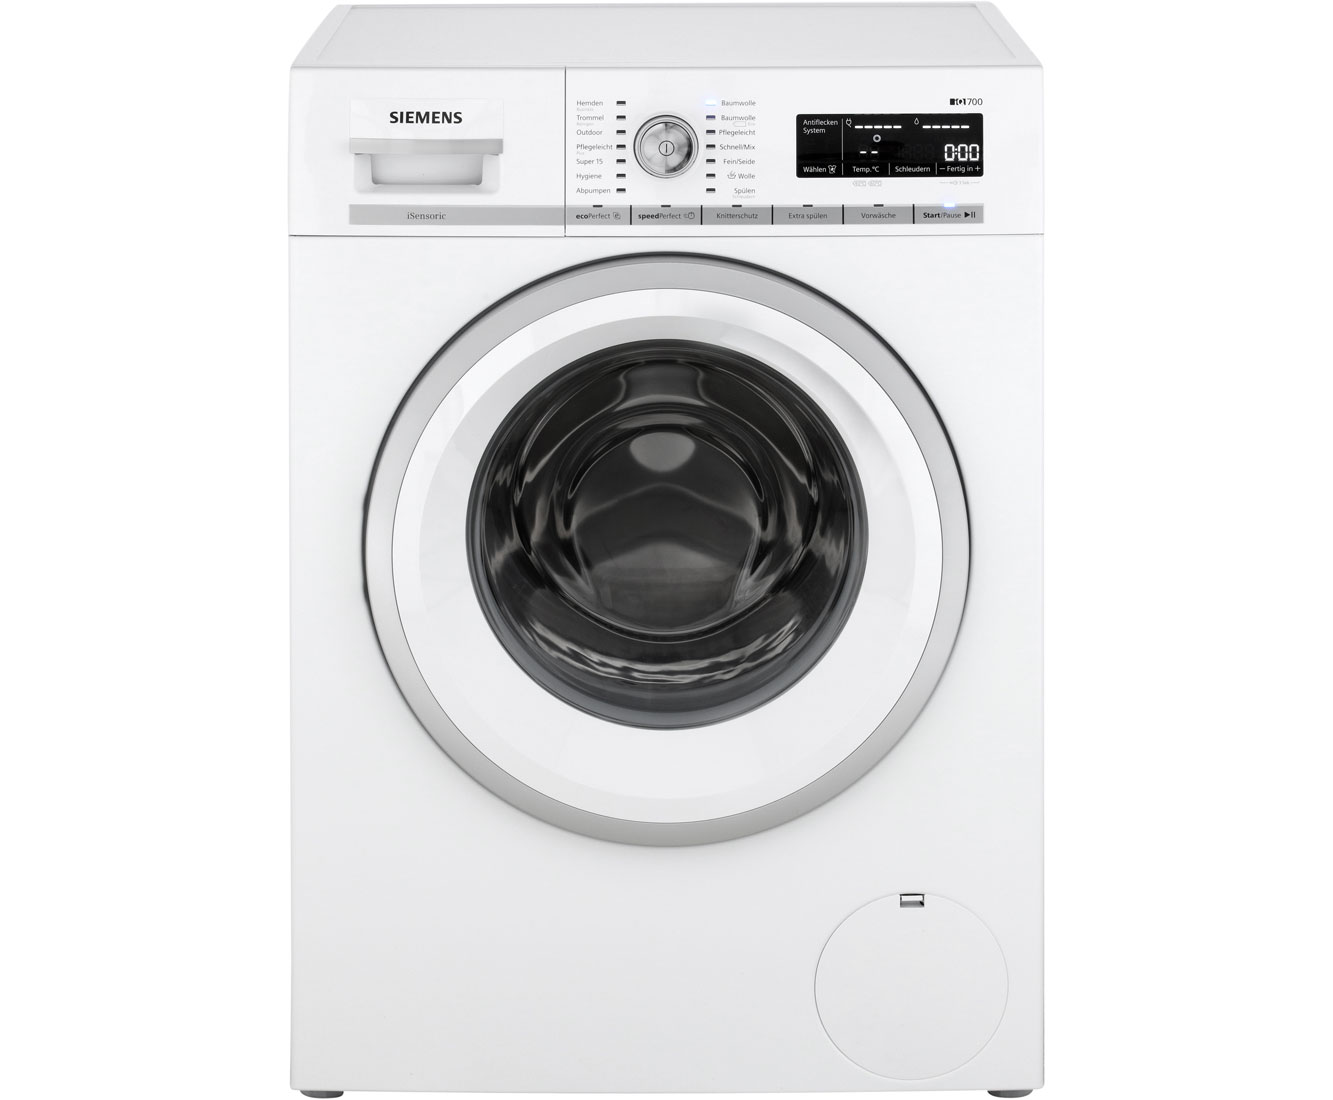 Siemens iq wm w waschmaschine kg u min a